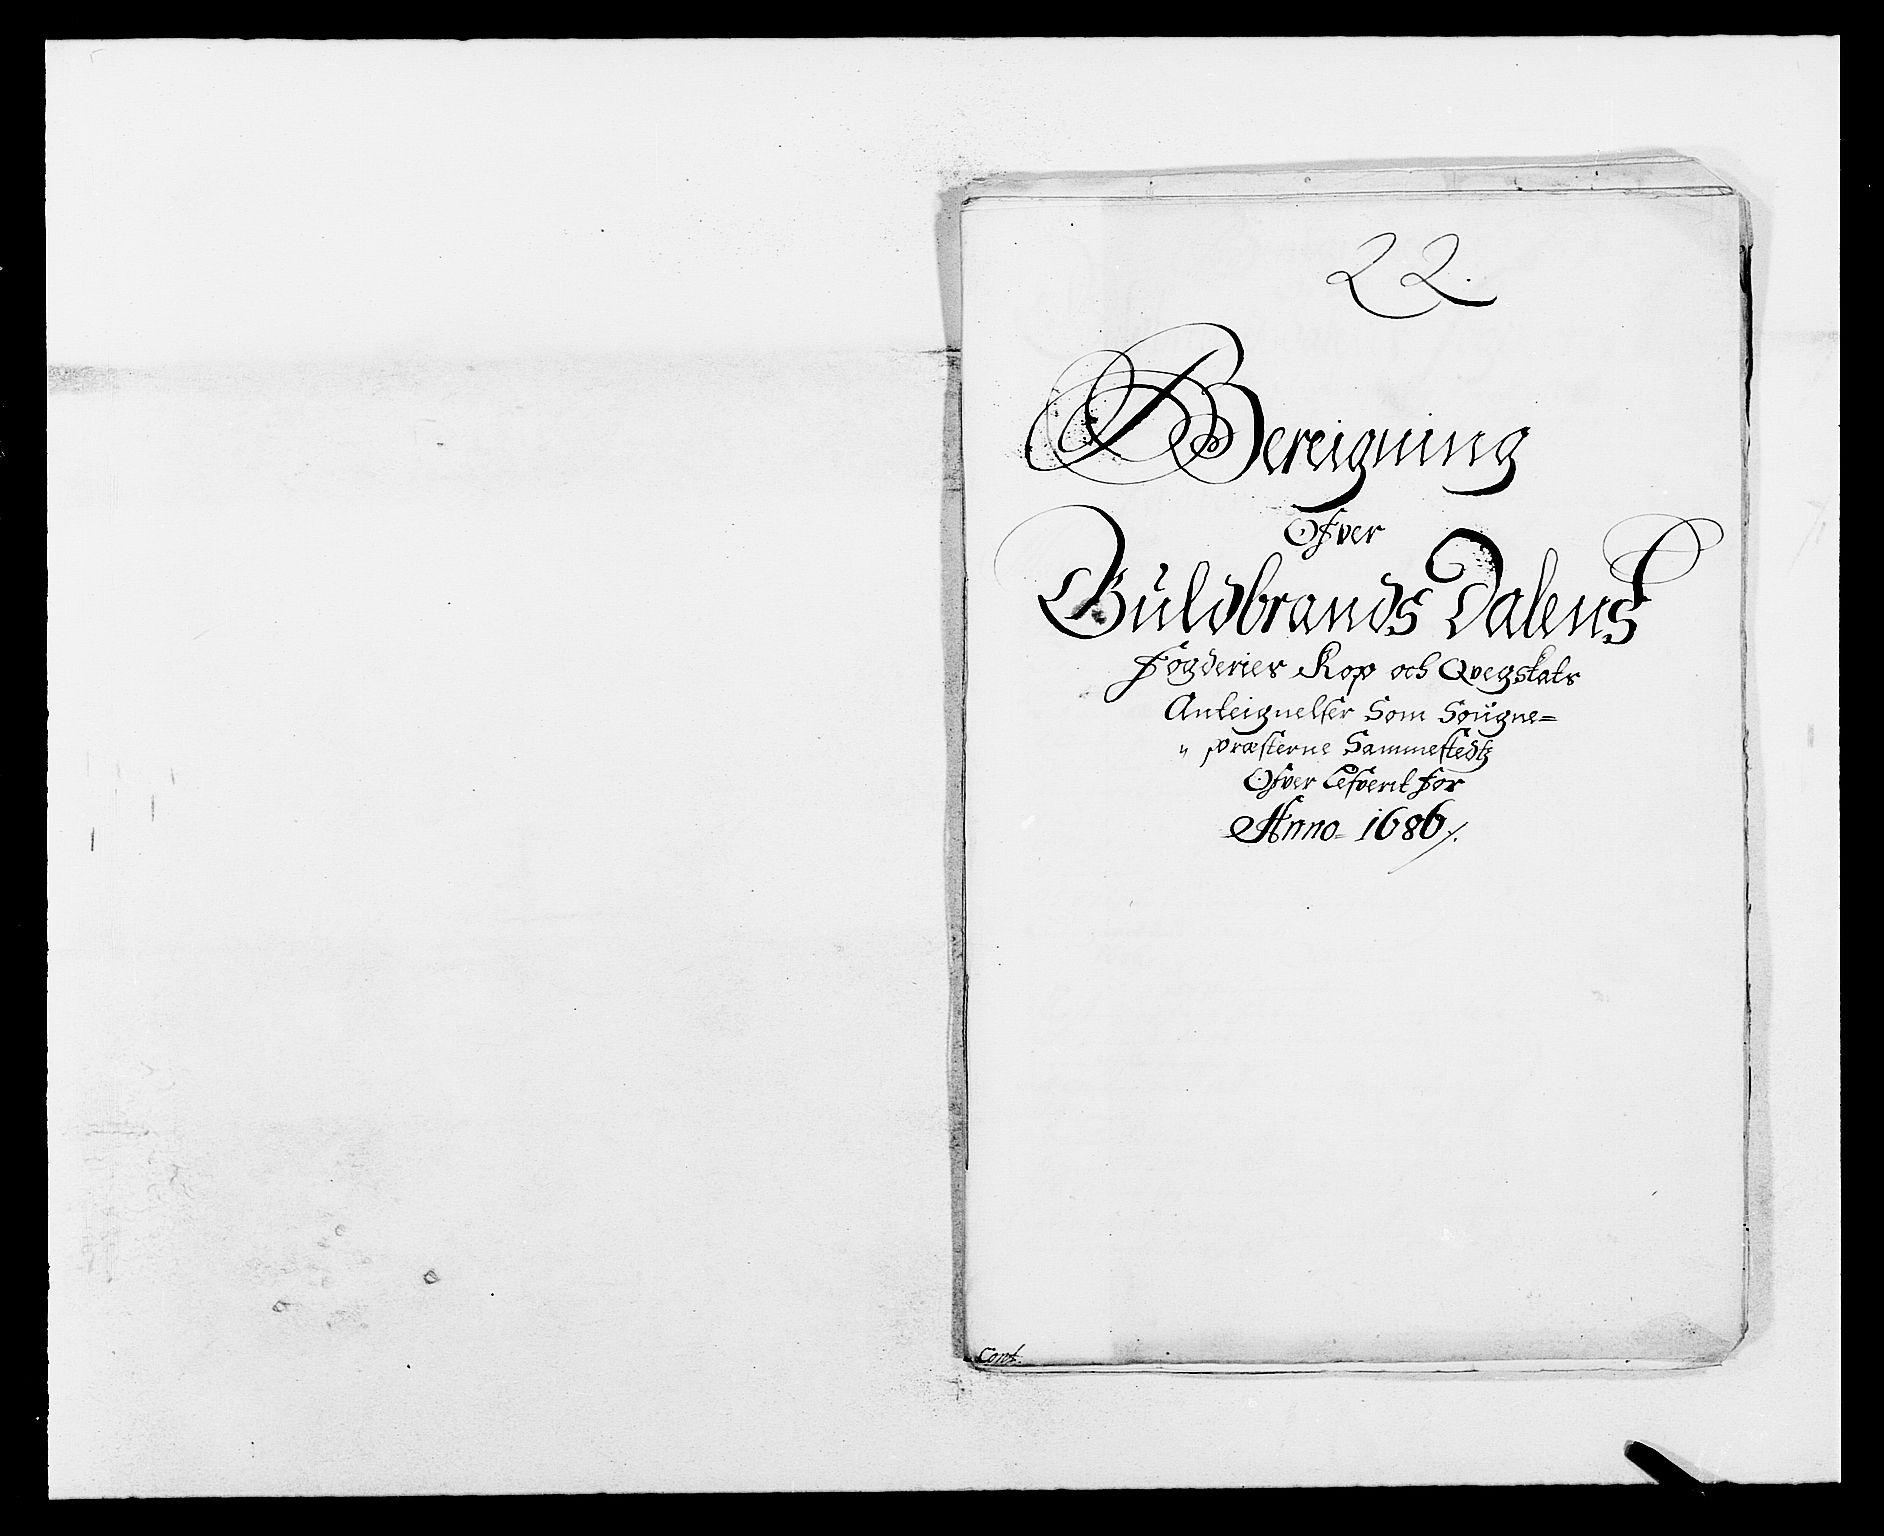 RA, Rentekammeret inntil 1814, Reviderte regnskaper, Fogderegnskap, R17/L1161: Fogderegnskap Gudbrandsdal, 1682-1689, s. 255